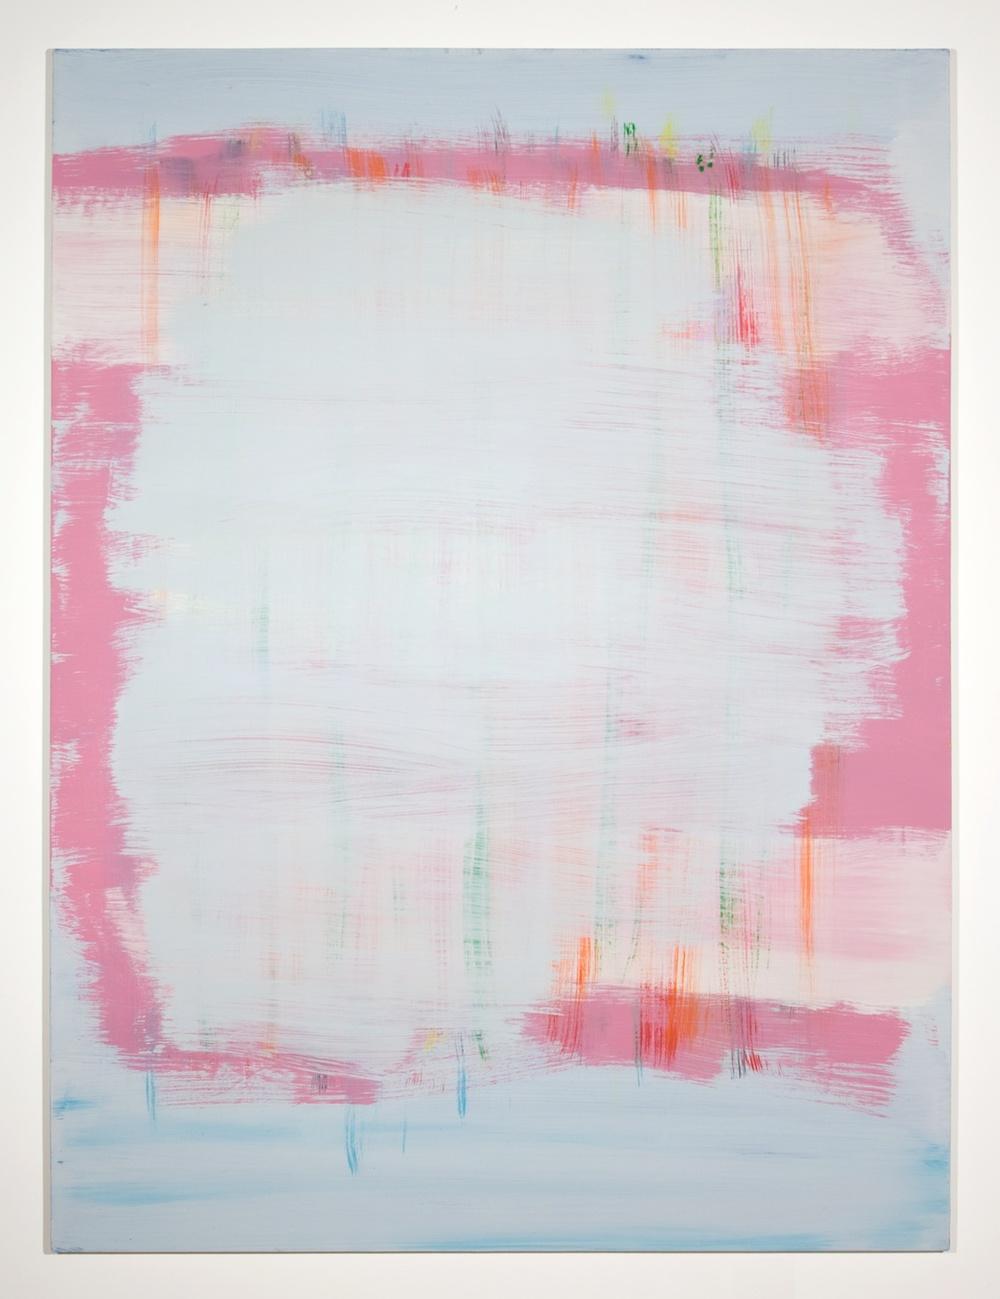 Jon Pestoni  Grey Smear  2010 Oil on canvas on panel 63 ½h x 47 ¼w in JP034